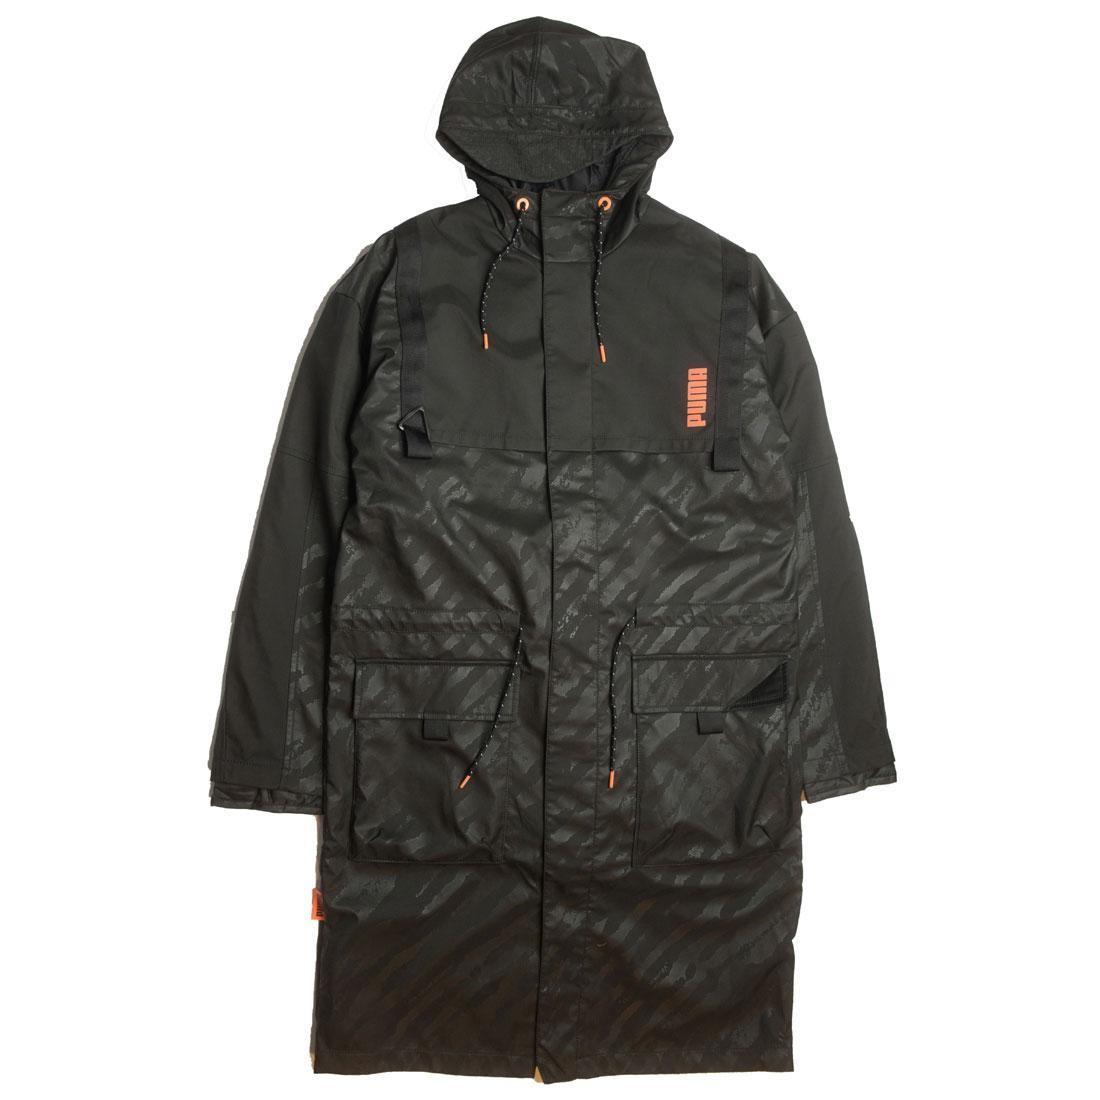 Puma x Central Saint Martins Men 2 In 1 Jacket (black)